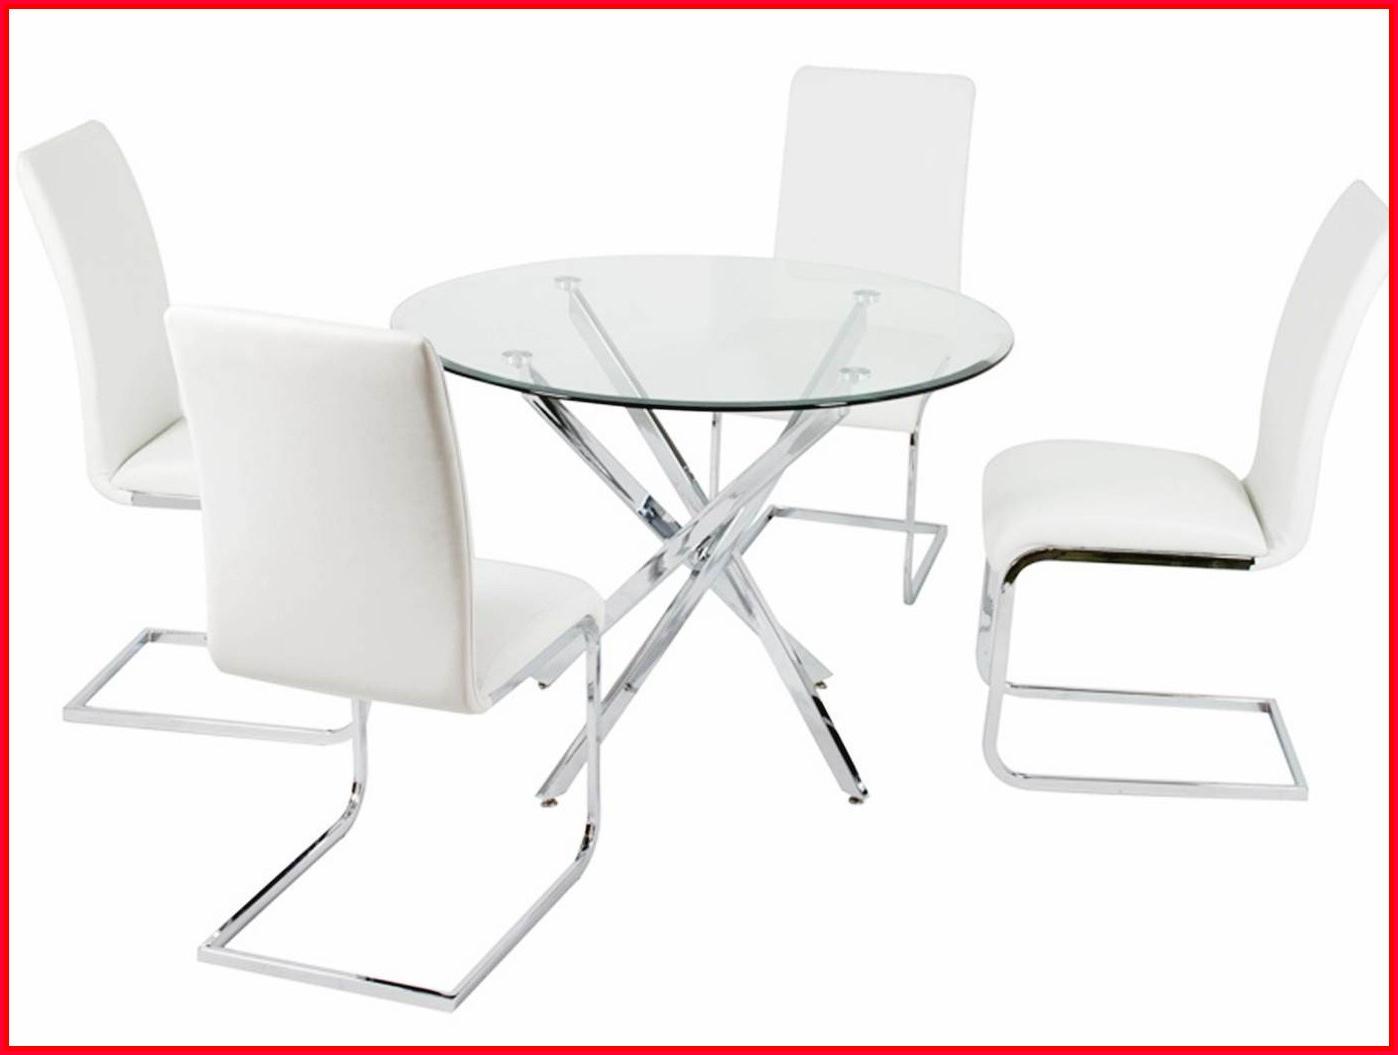 Mesas cristal ikea perfect mesa despacho cristal ikea for Mesa redonda cristal ikea